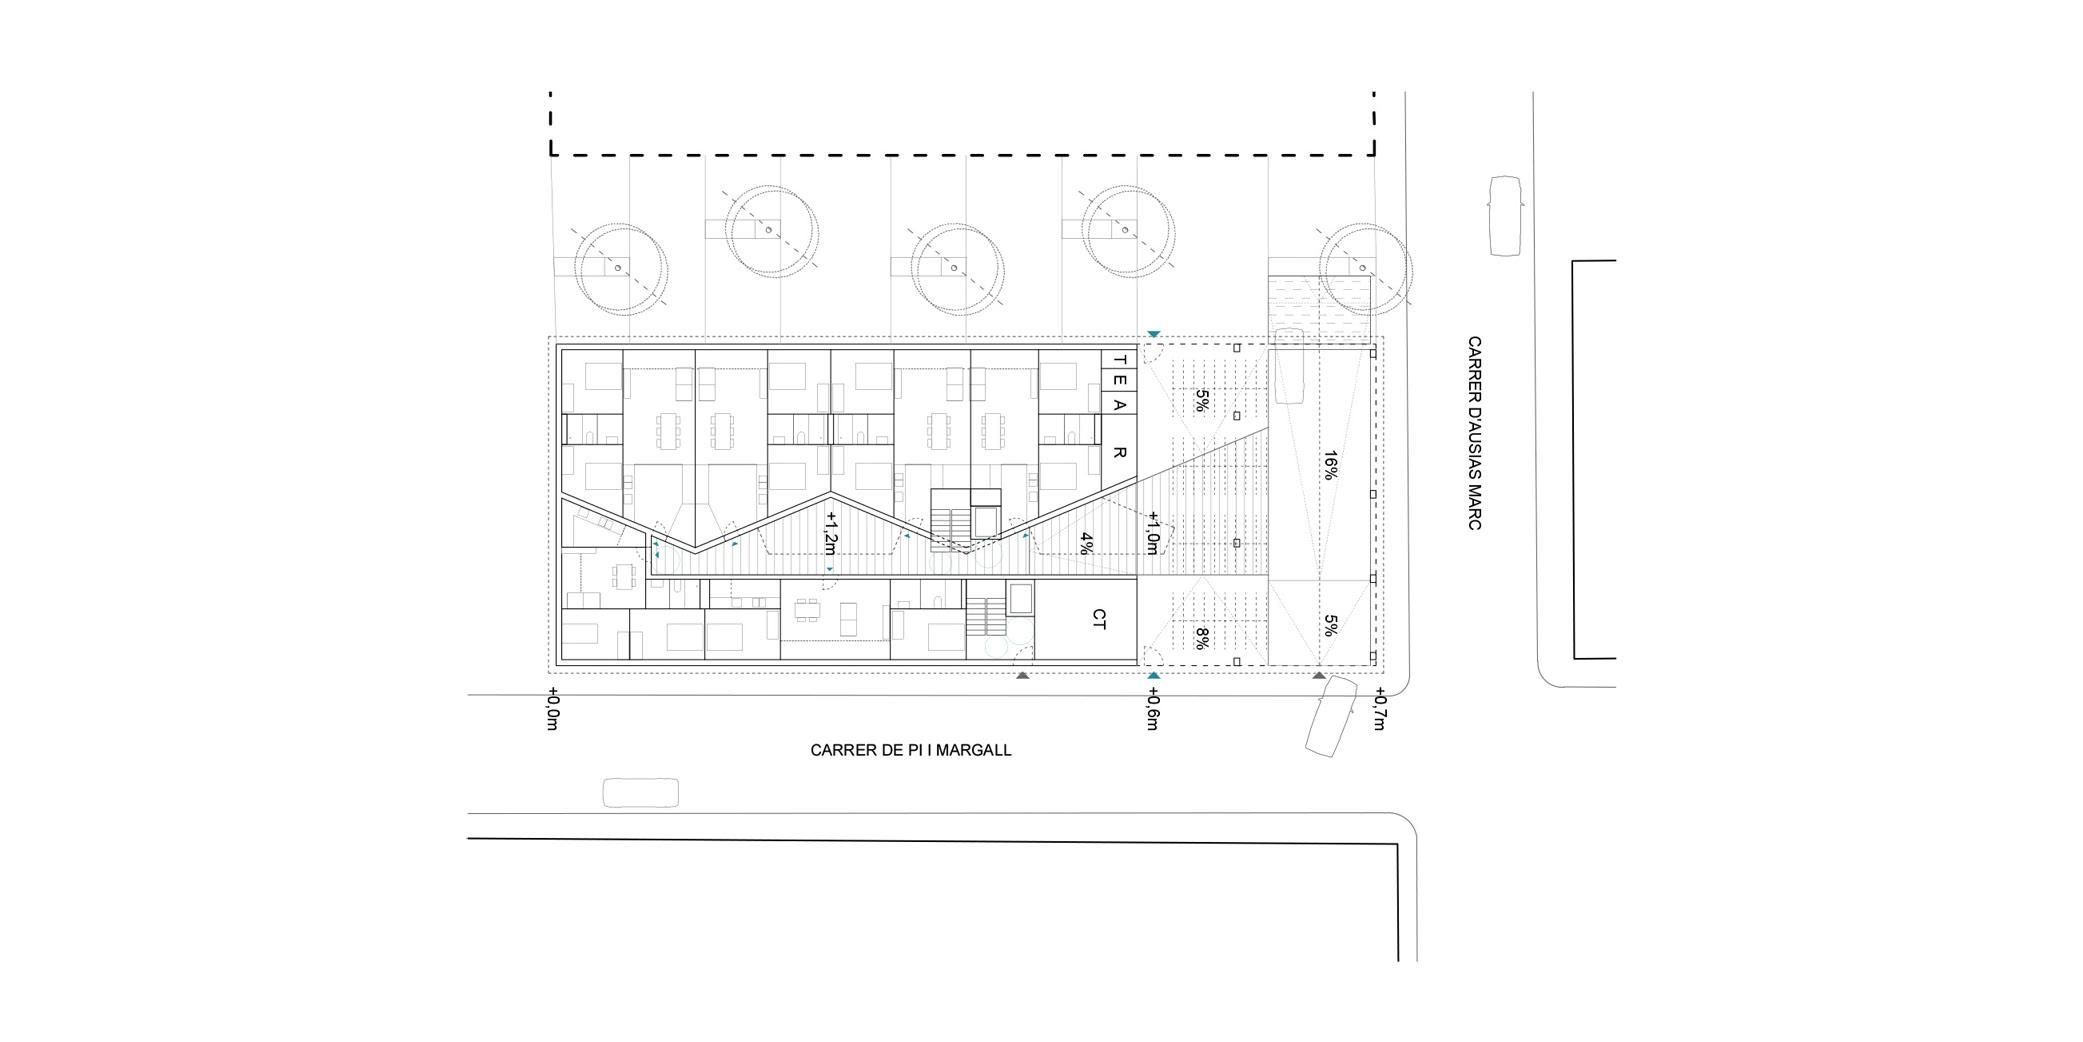 Terrasa housing OCA ARCHITEctS OCA ARQUITECTOS architecture design Hernan Lleida Bernardo Garcia 2